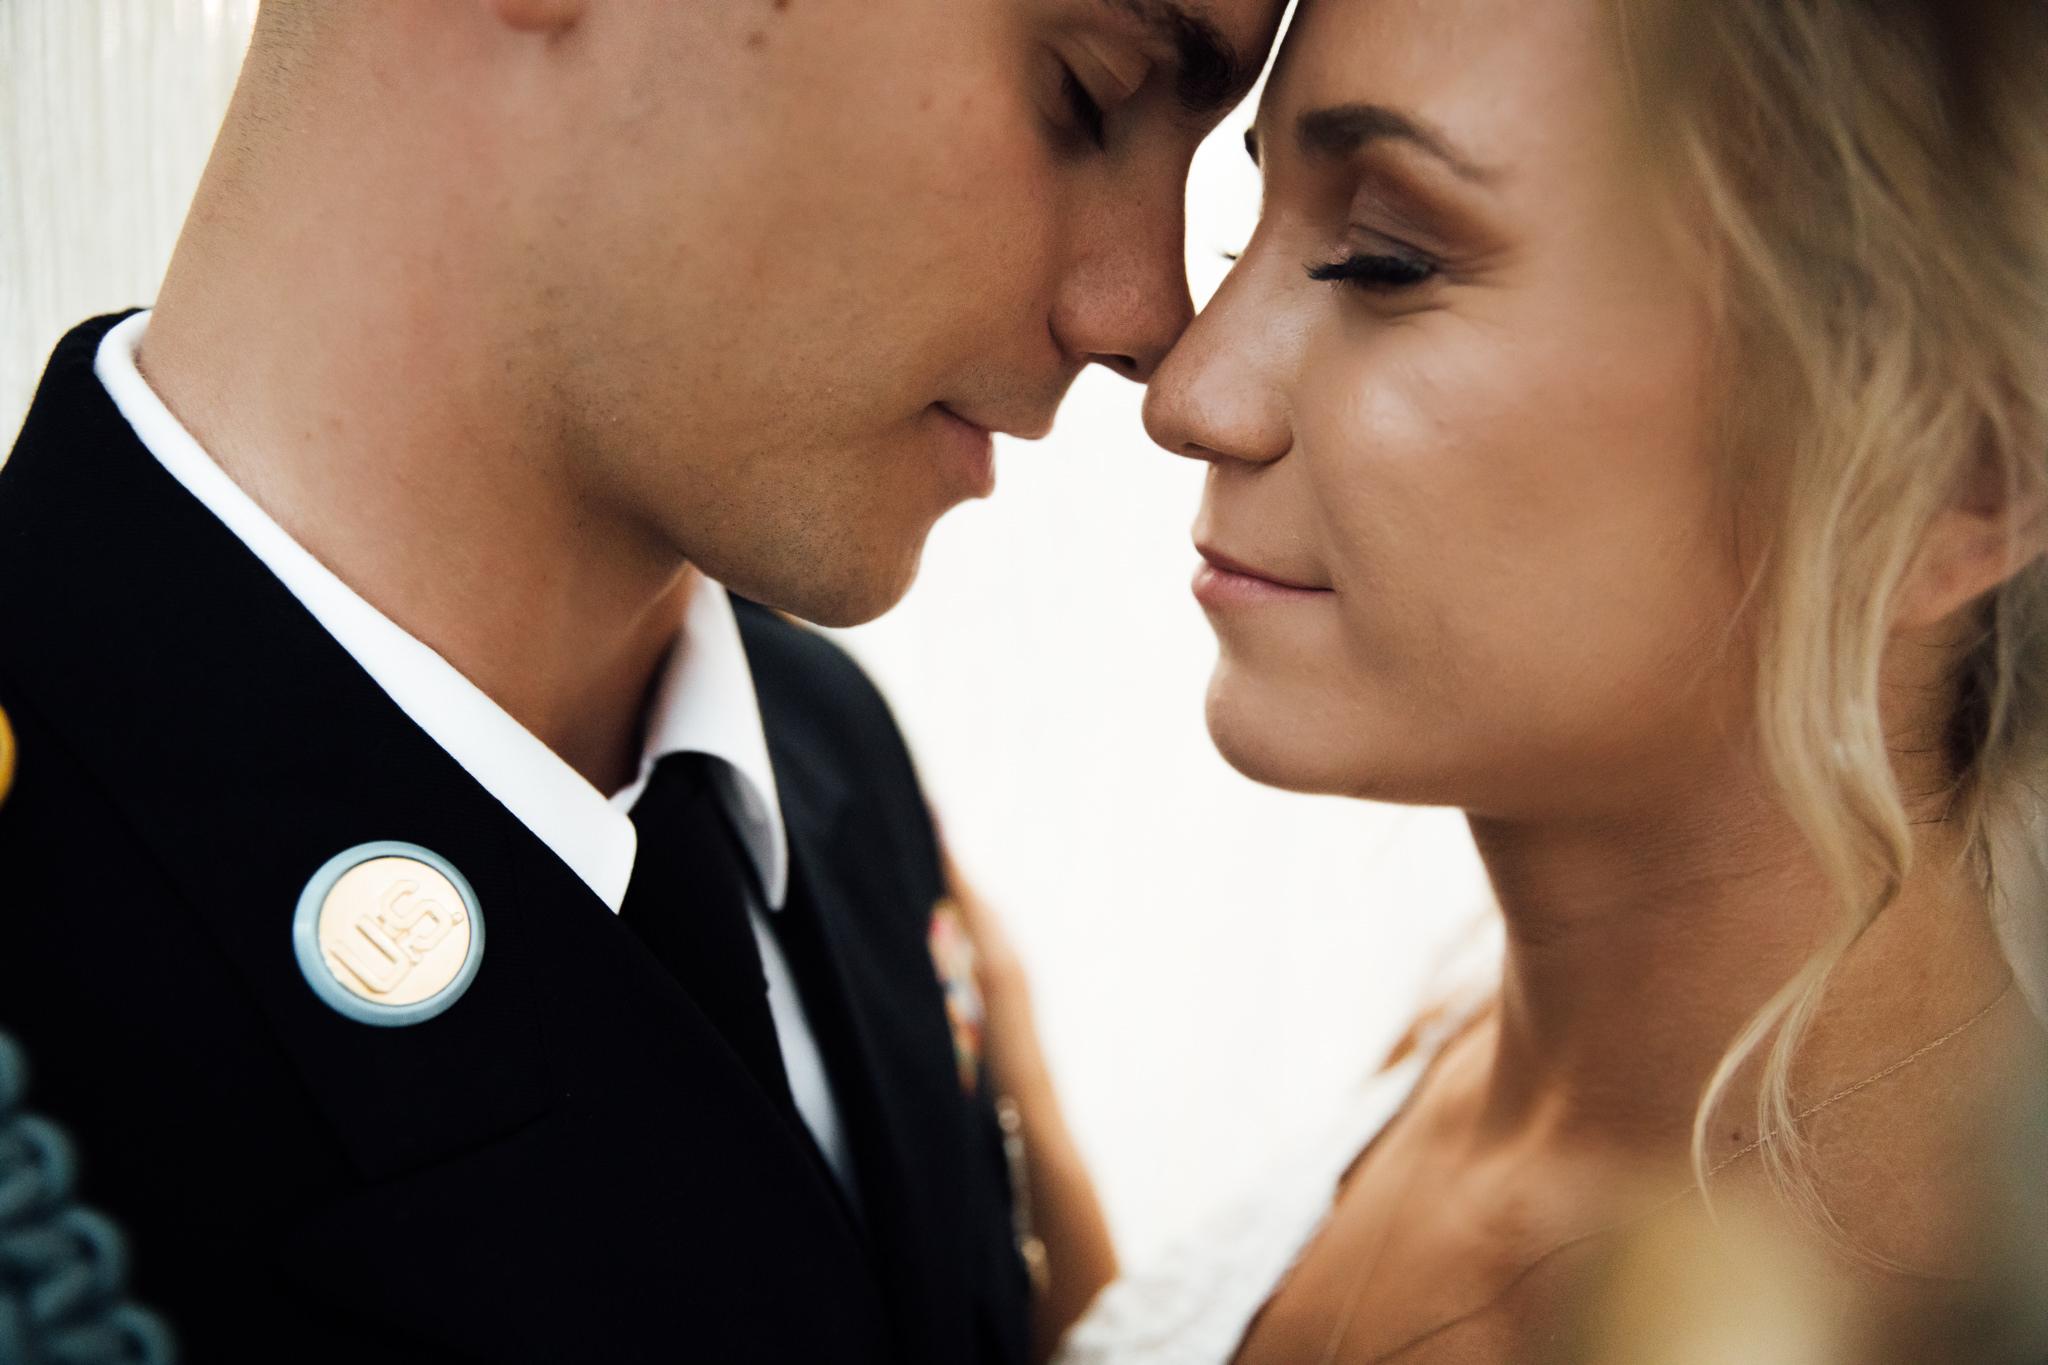 backyard-wedding-thewarmtharoundyou-lexy-branson-71.jpg